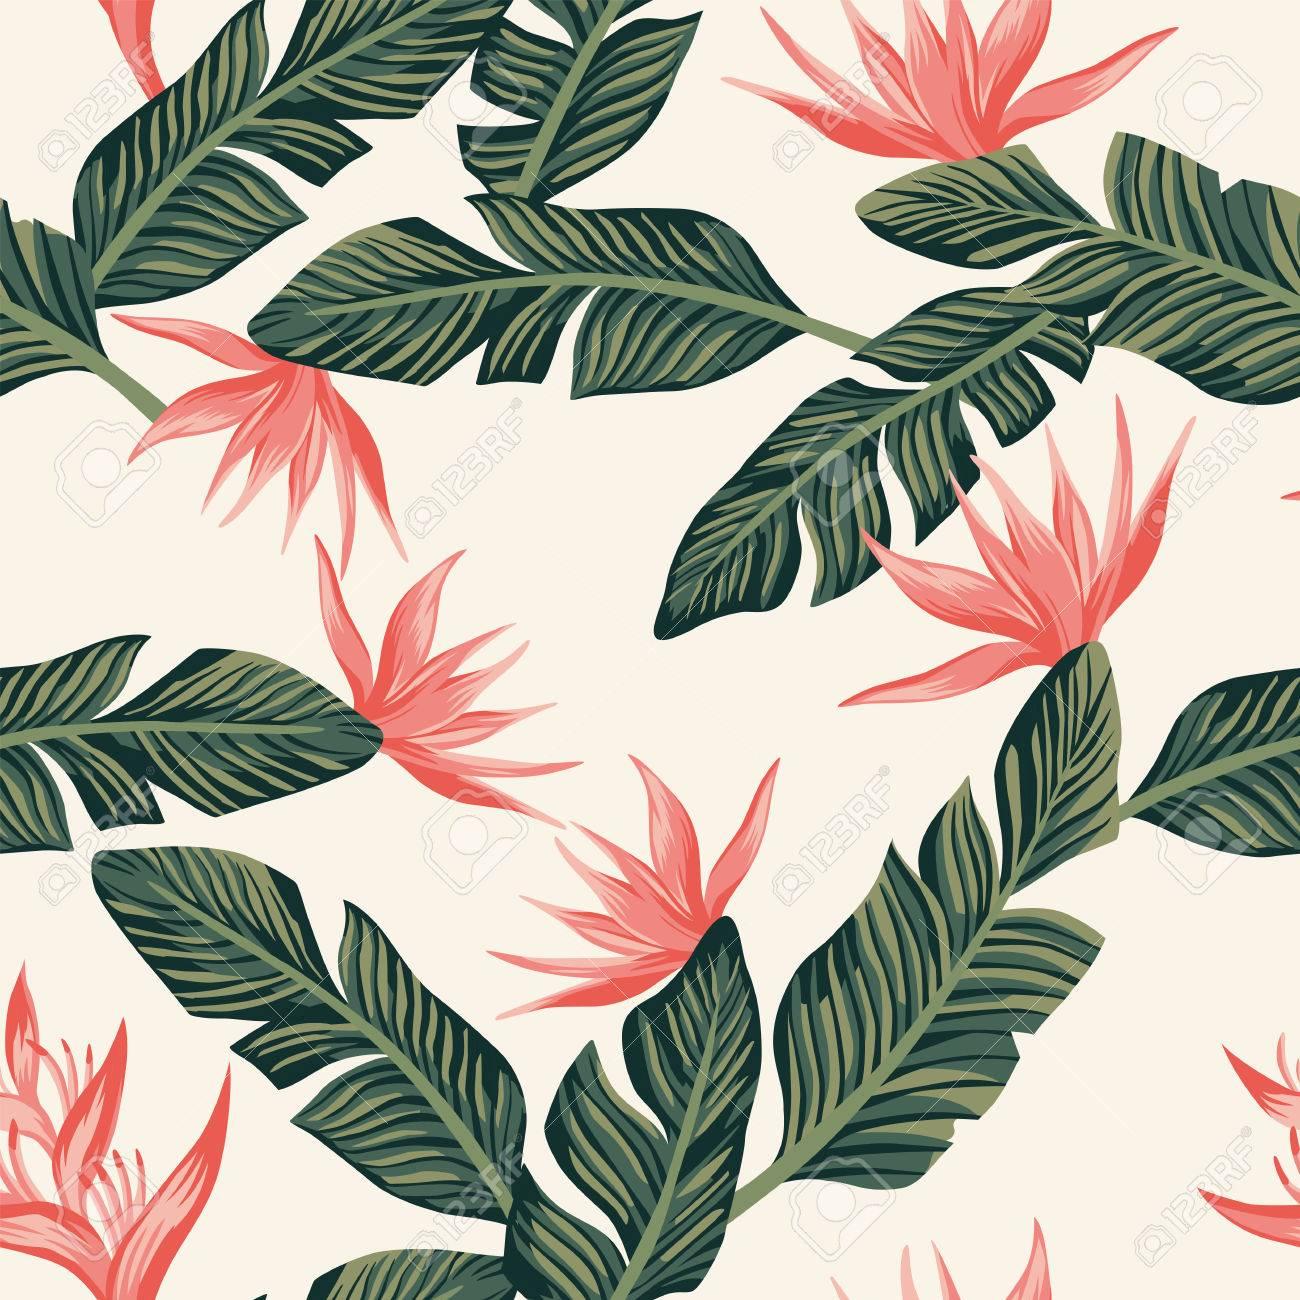 Beach Cheerful Seamless Pattern Wallpaper Of Tropical Dark Green